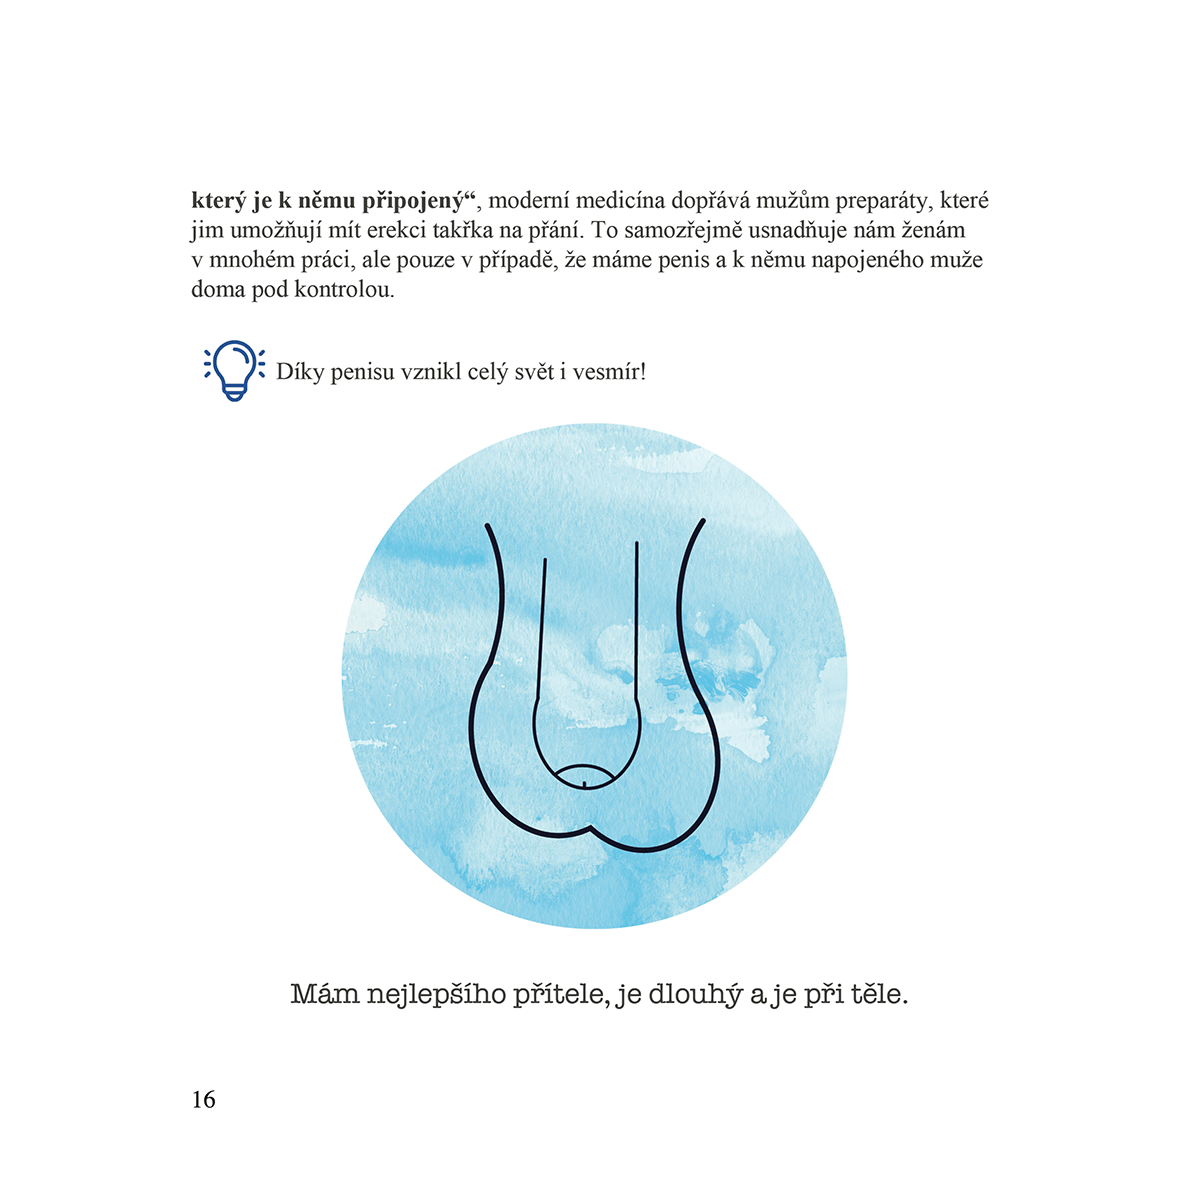 ukazka 8